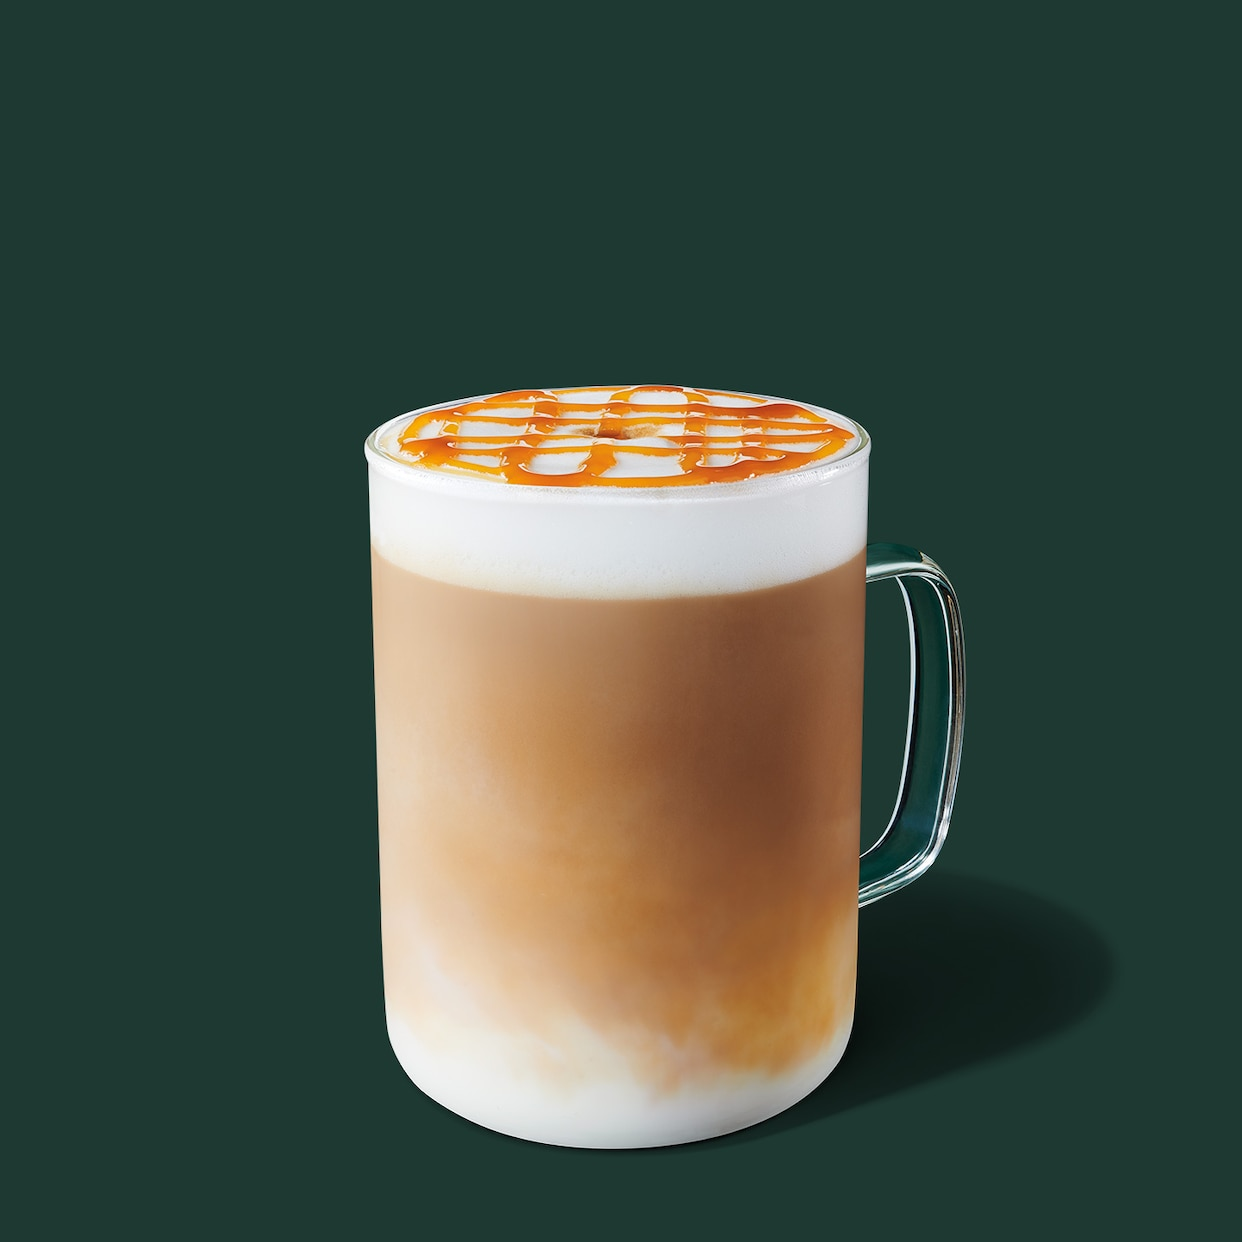 Caramel Macchiato Starbucks Coffee Company